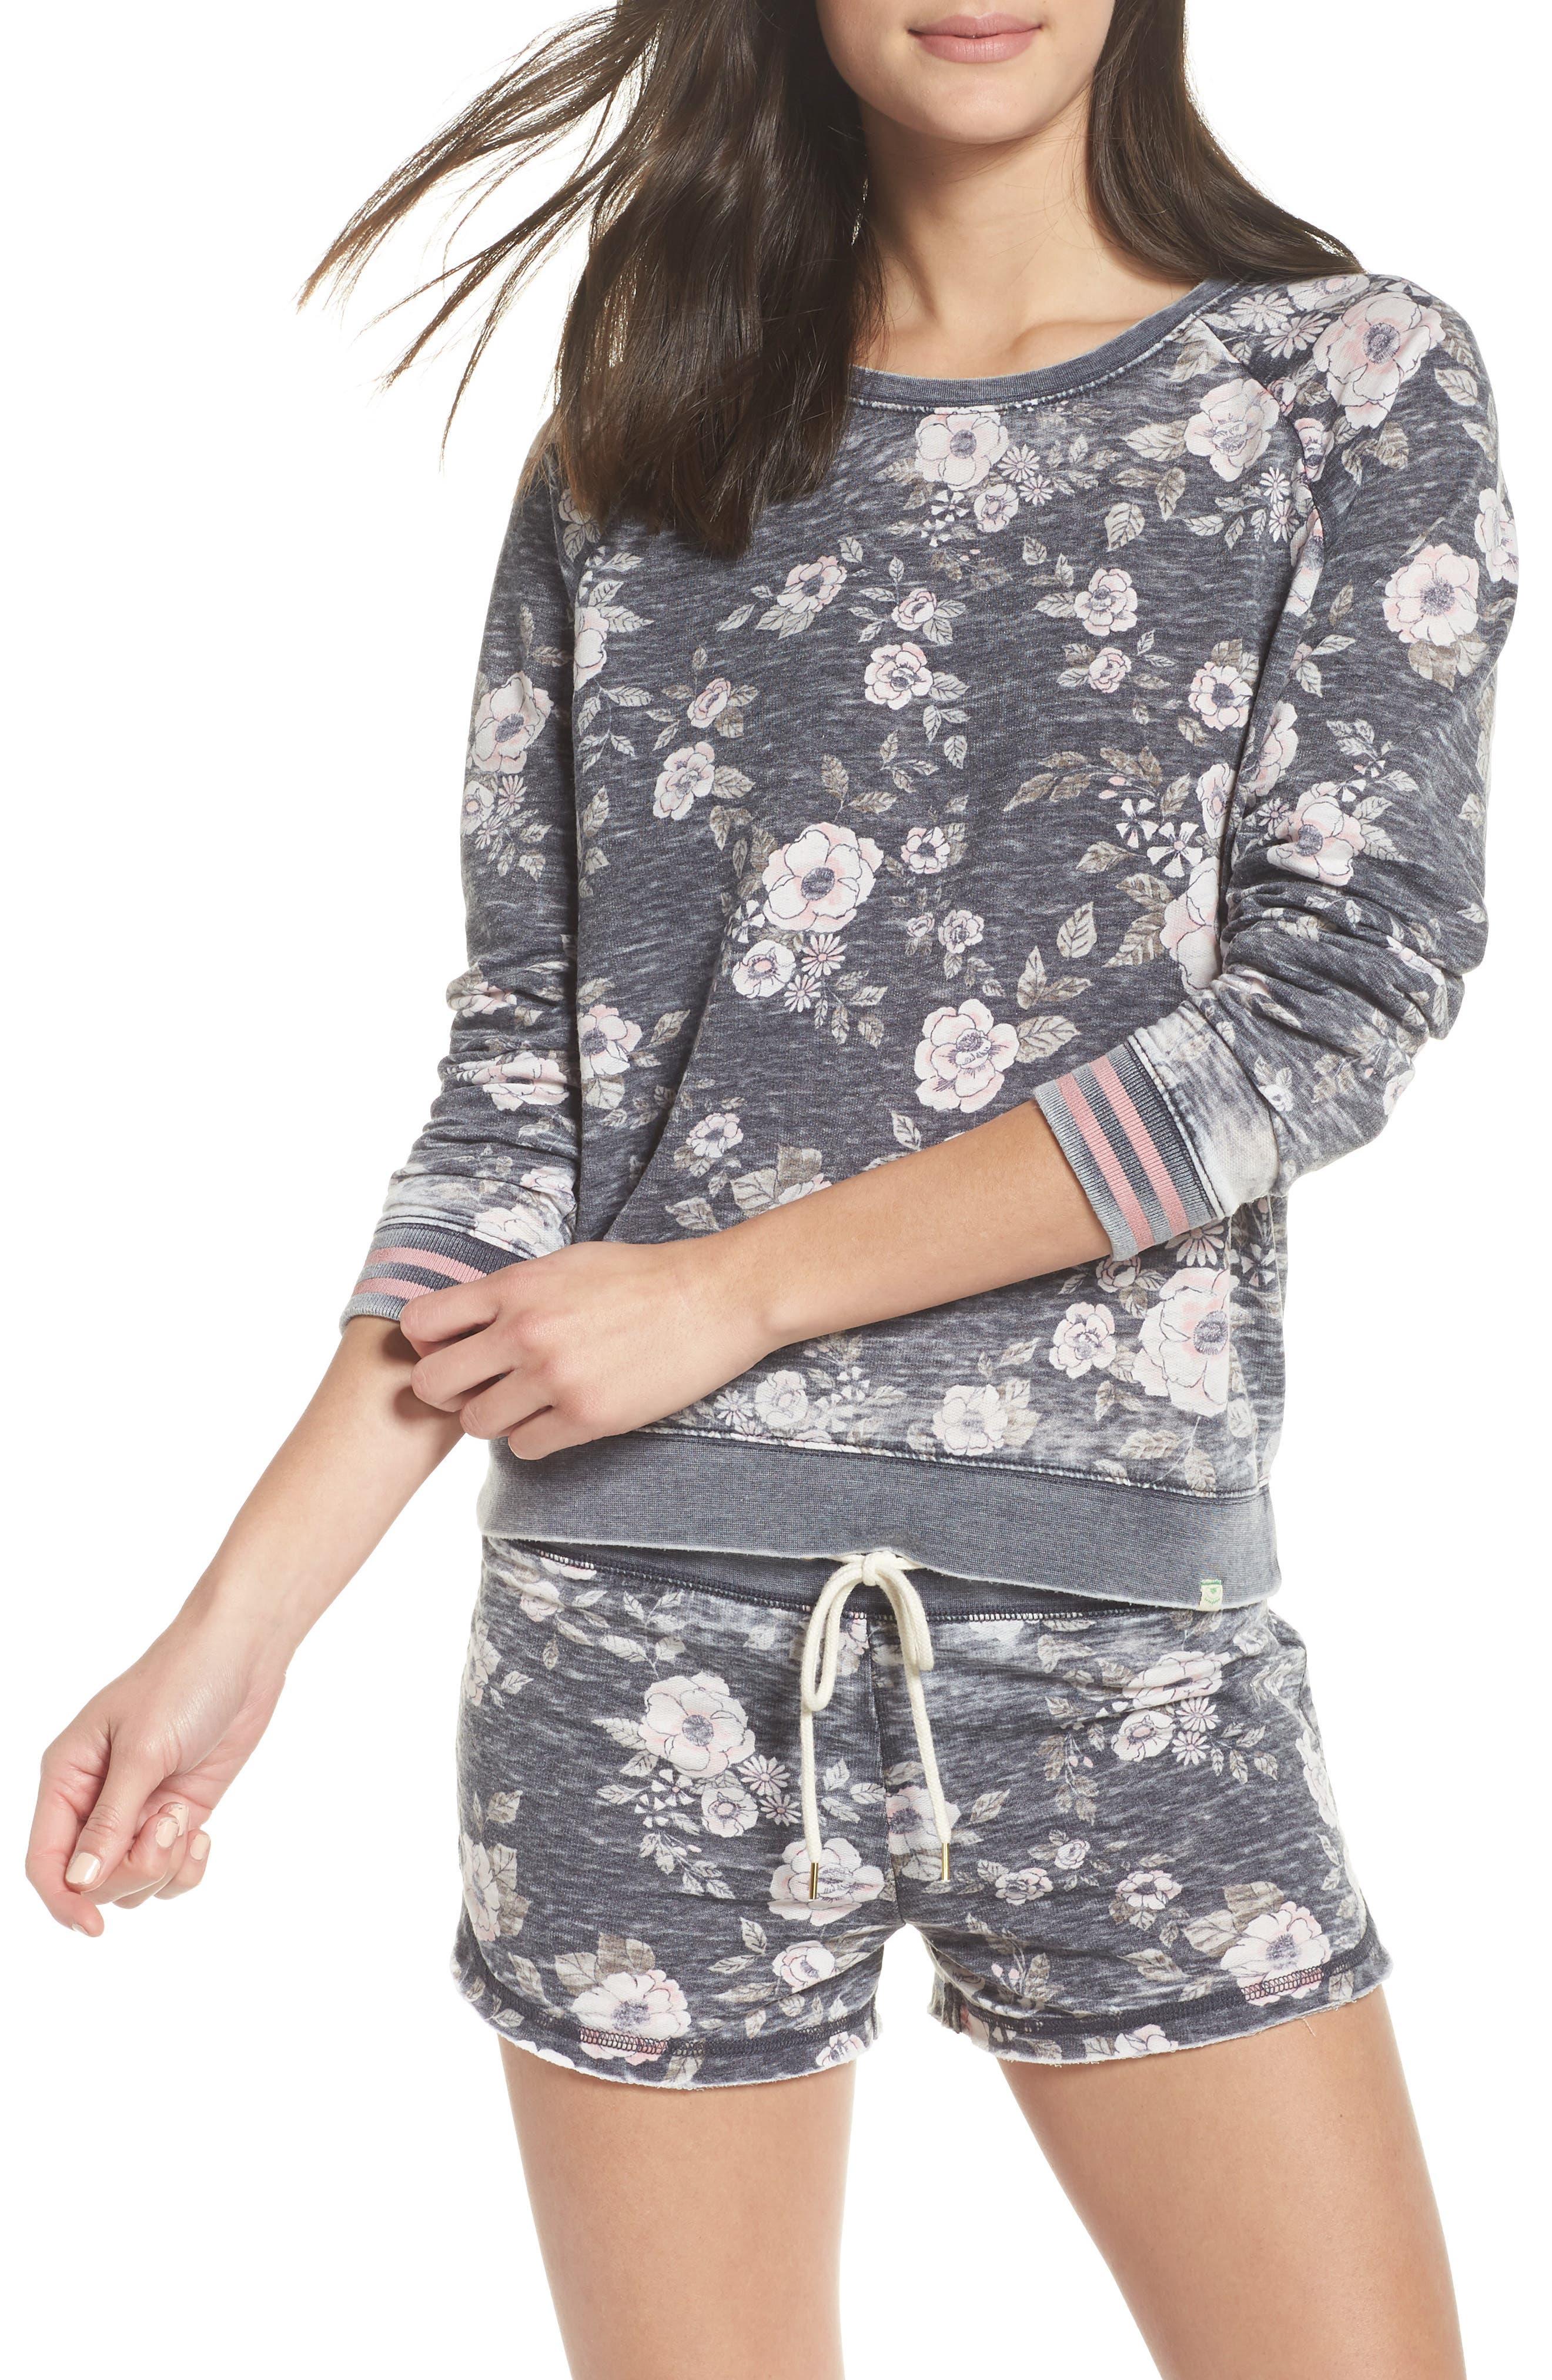 Burnout Lounge Sweatshirt by Honeydew Intimates